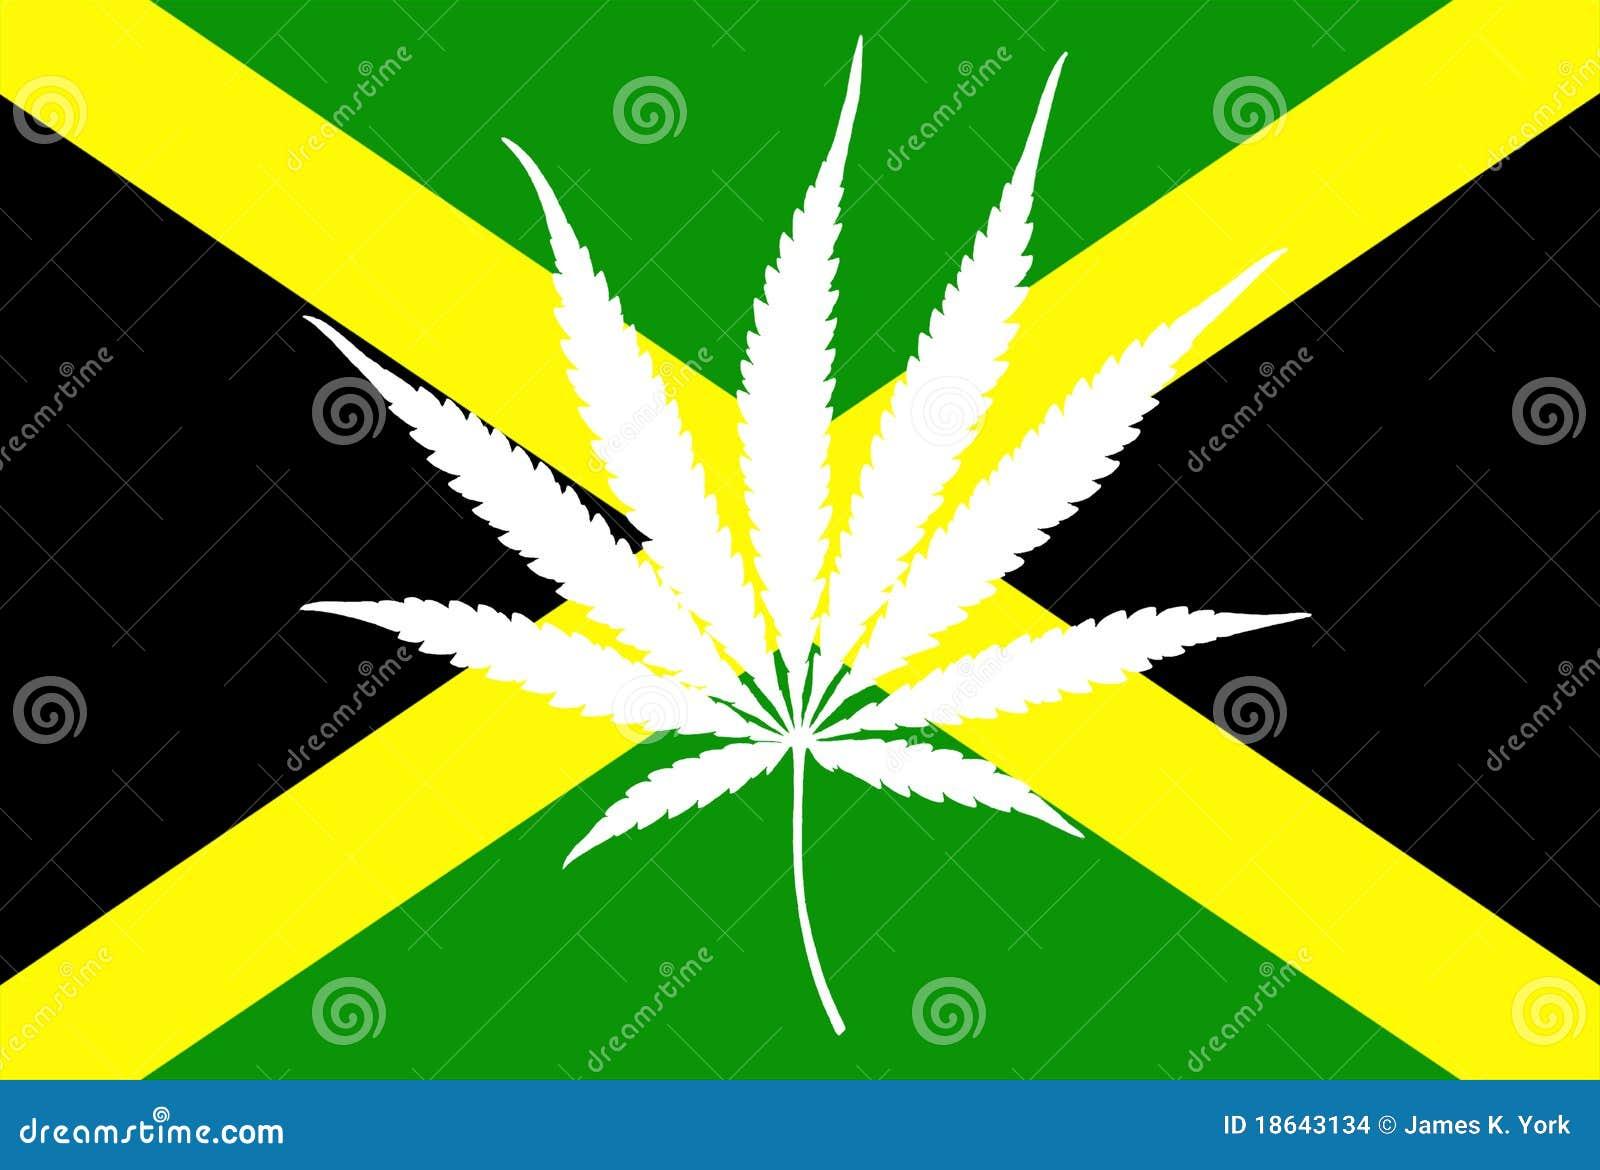 Jamaican Flag Marijuana Leaf Stock Images - Image: 18643134